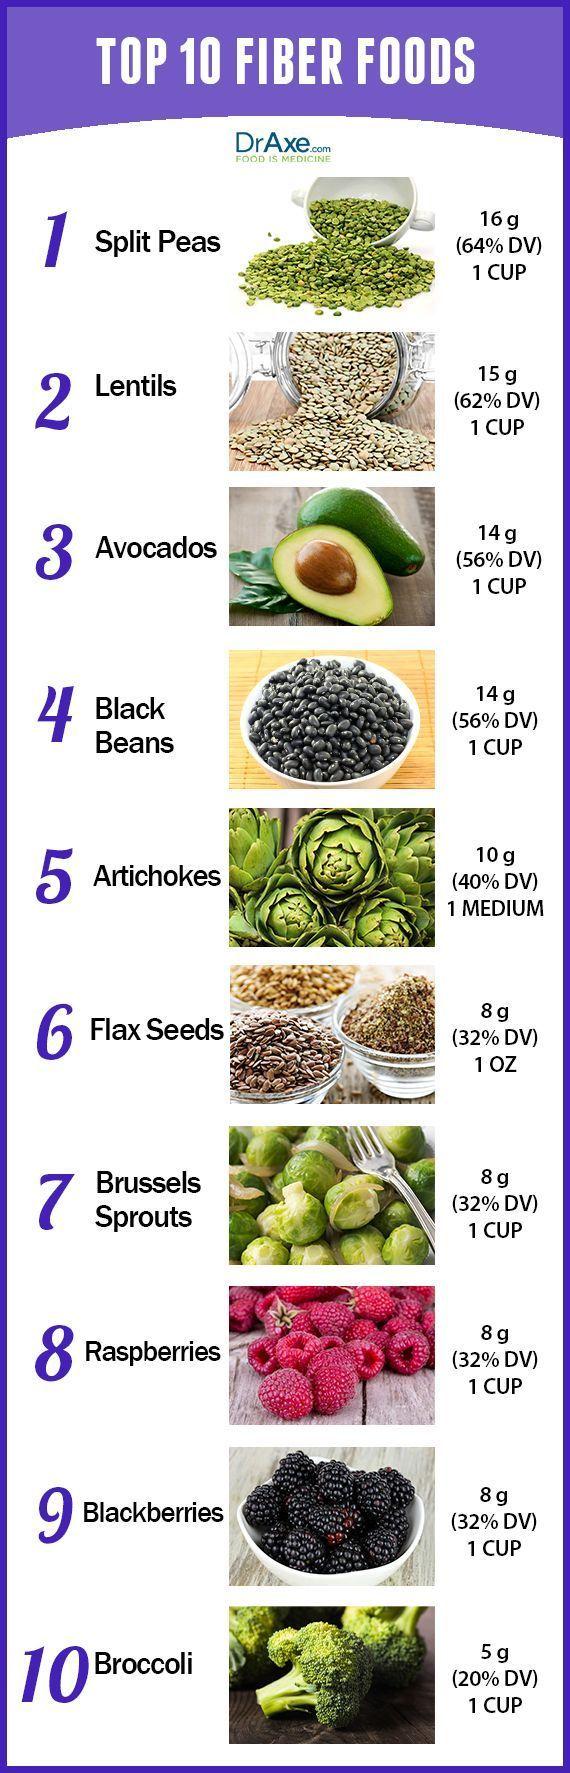 Top 10 High Fiber Foods - DrAxe.com